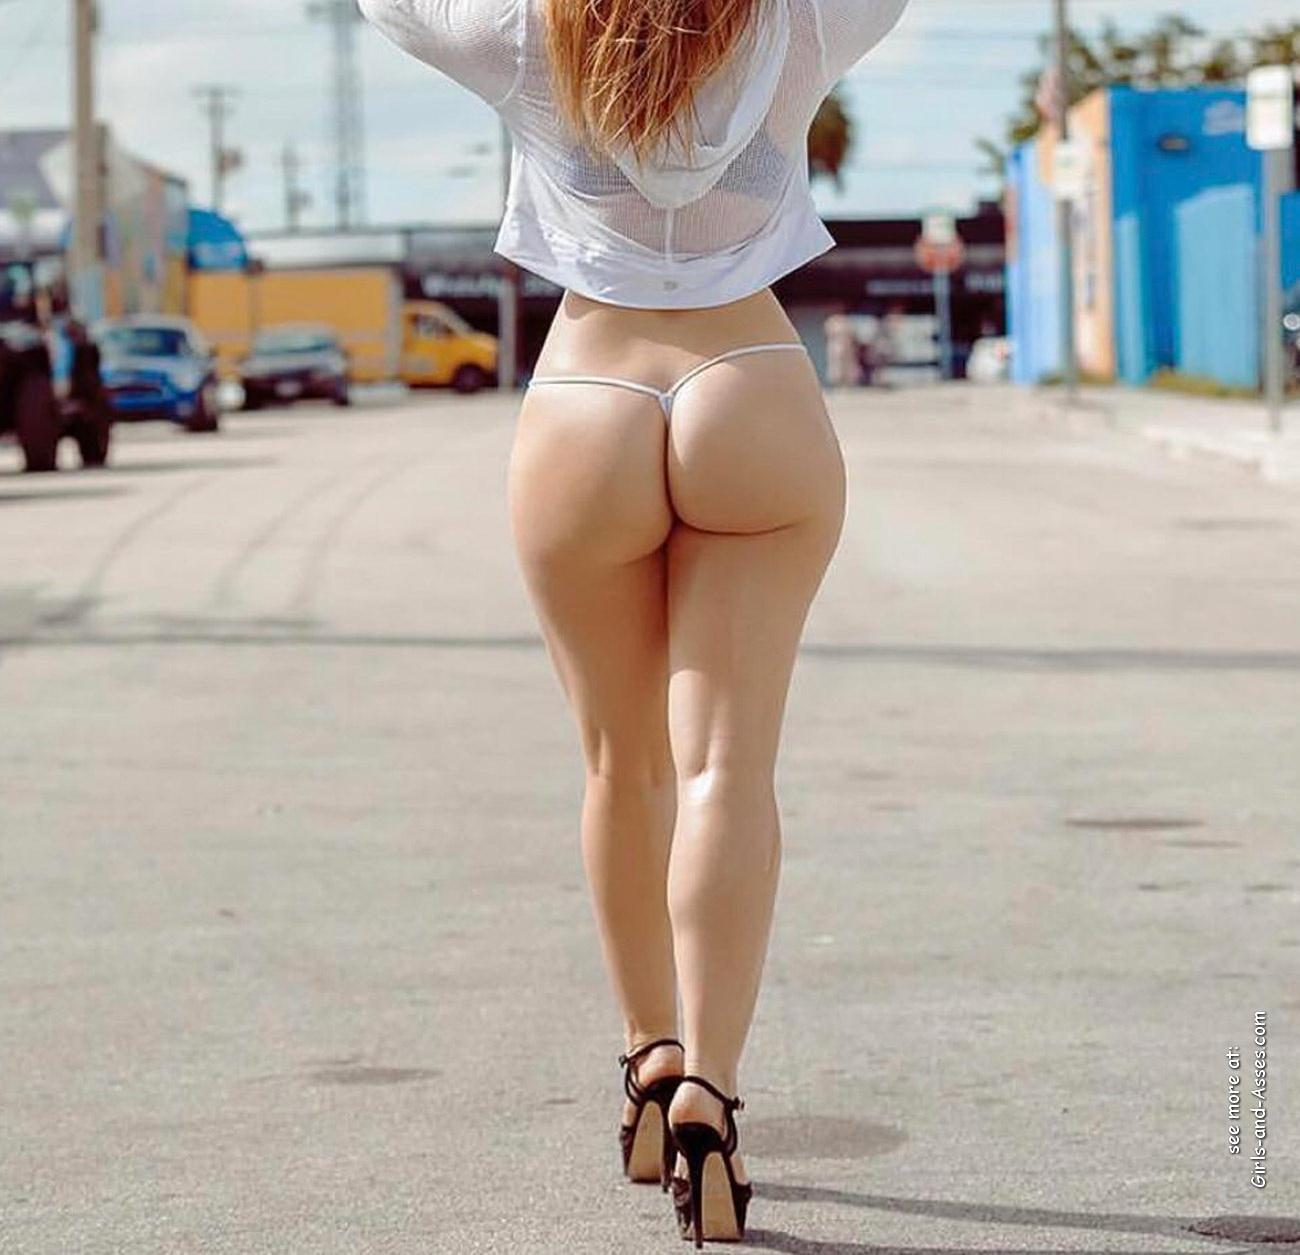 hot nude cheeks ass walking the street photo 02153